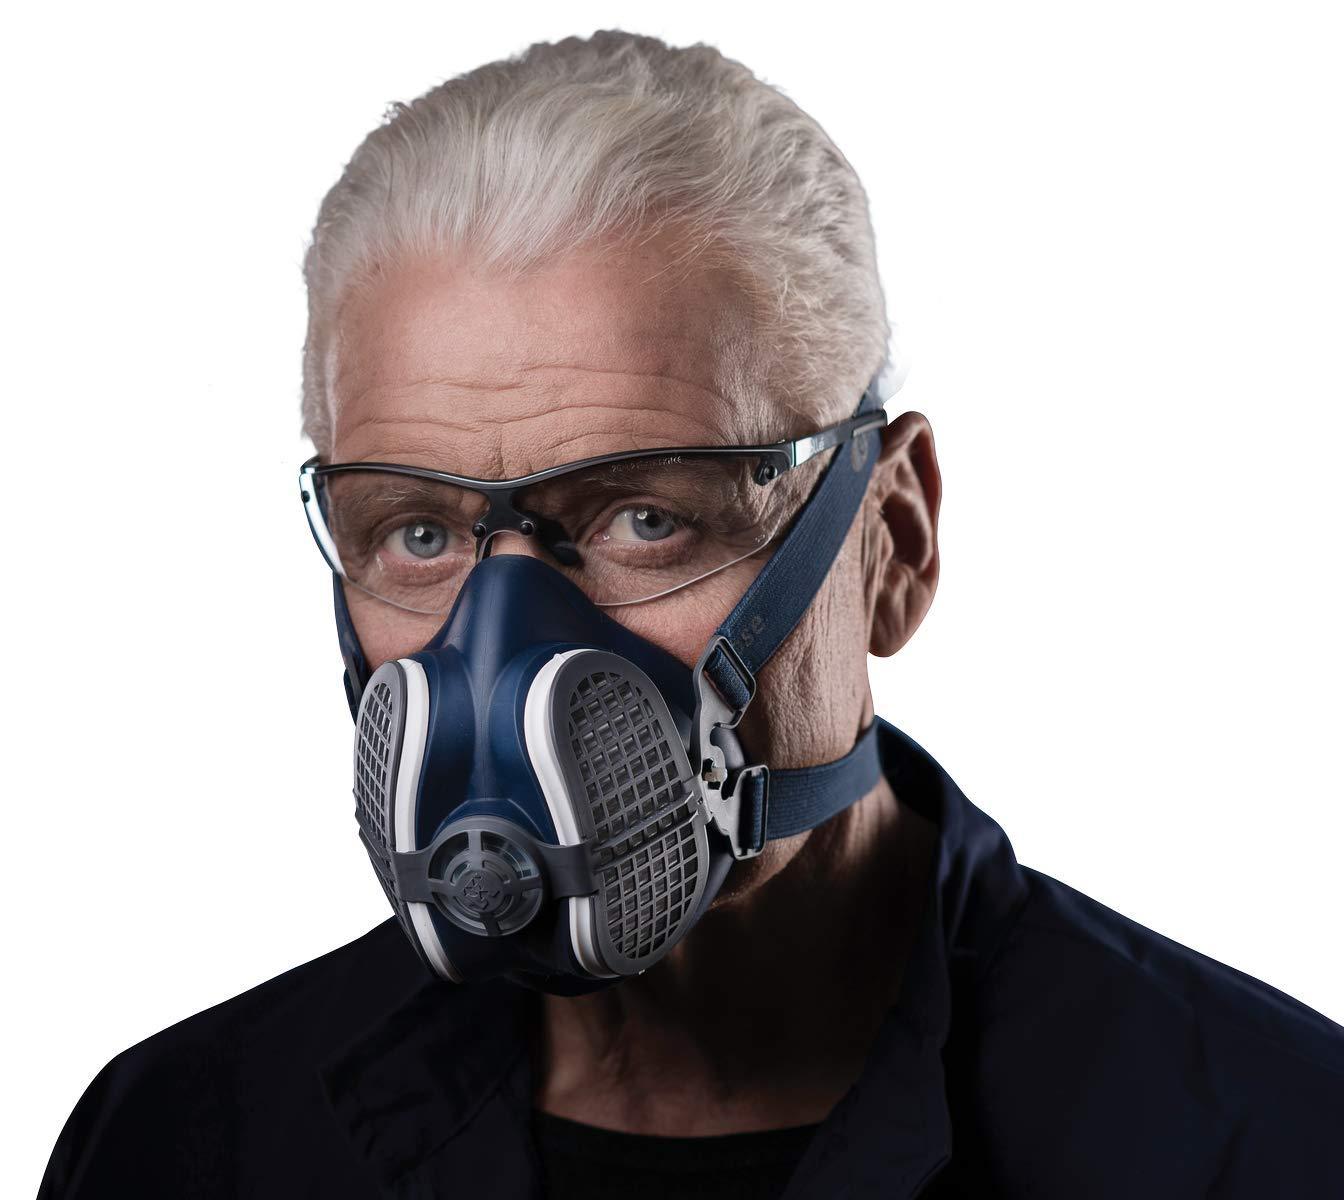 Promos Masques de protection,Bricolage - App4promos f4cc8f586588